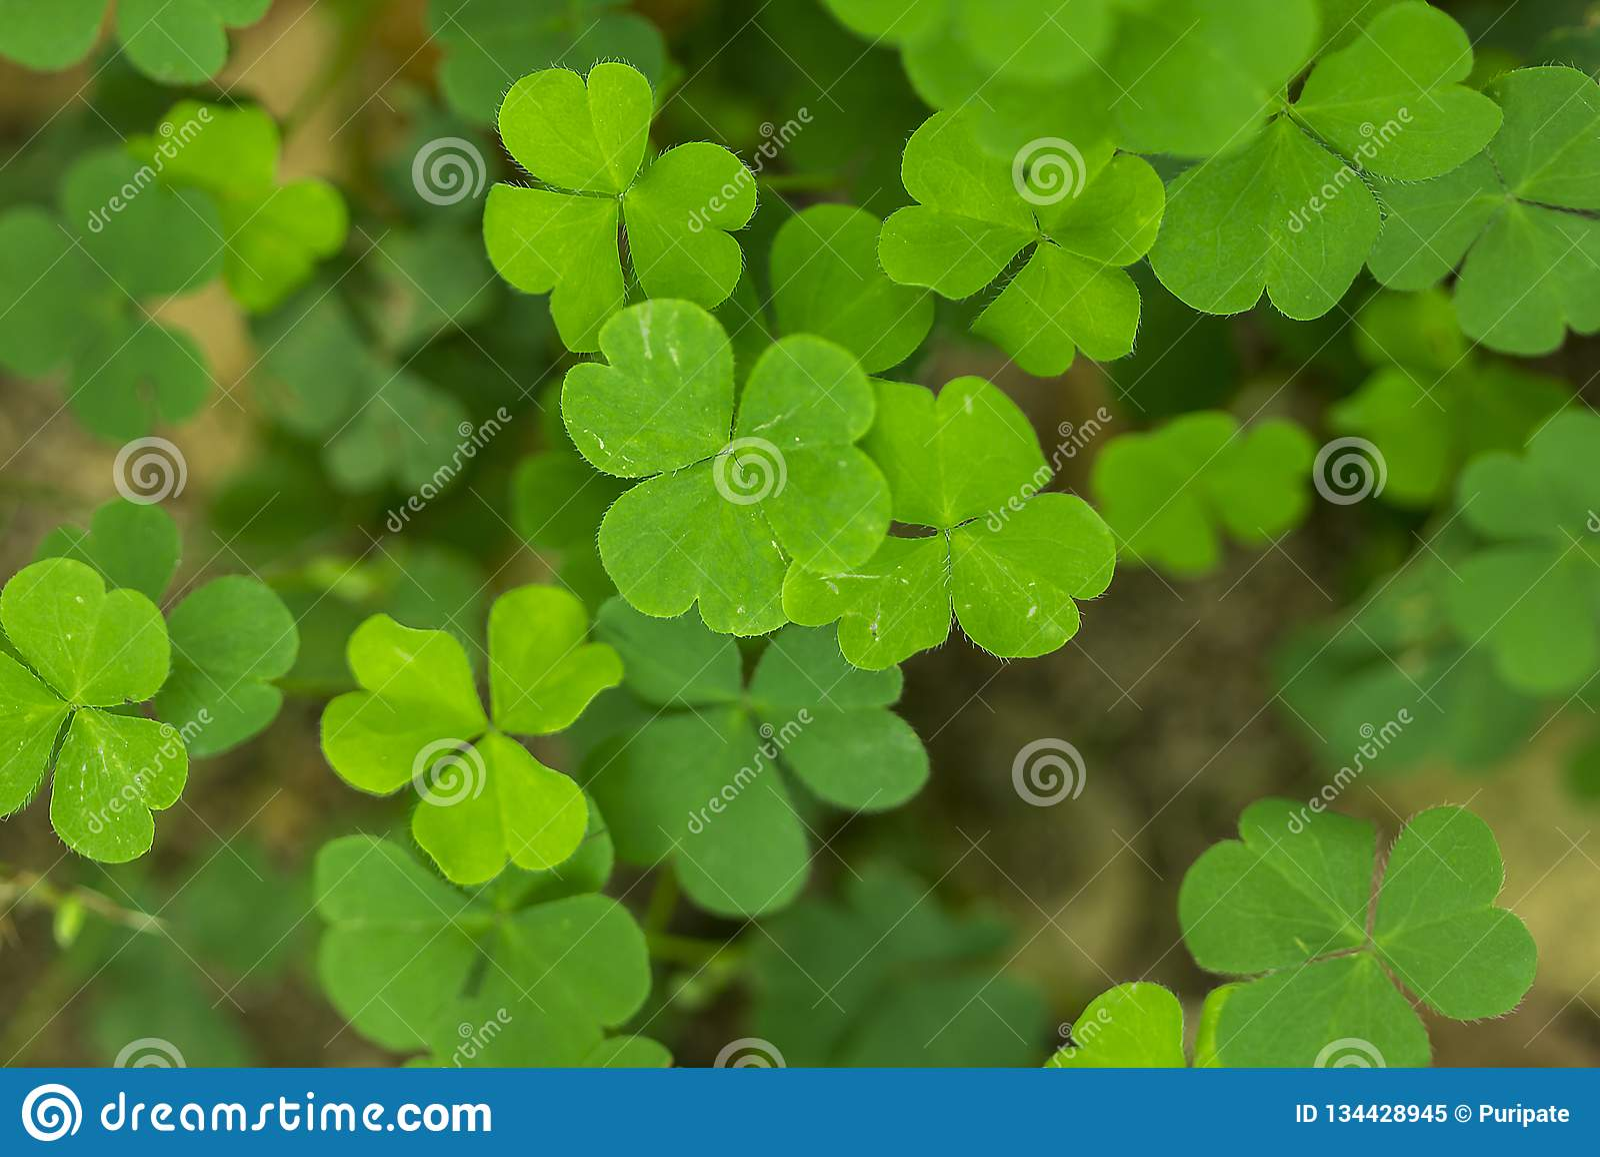 Marsilea crenata is a fern species in nature.